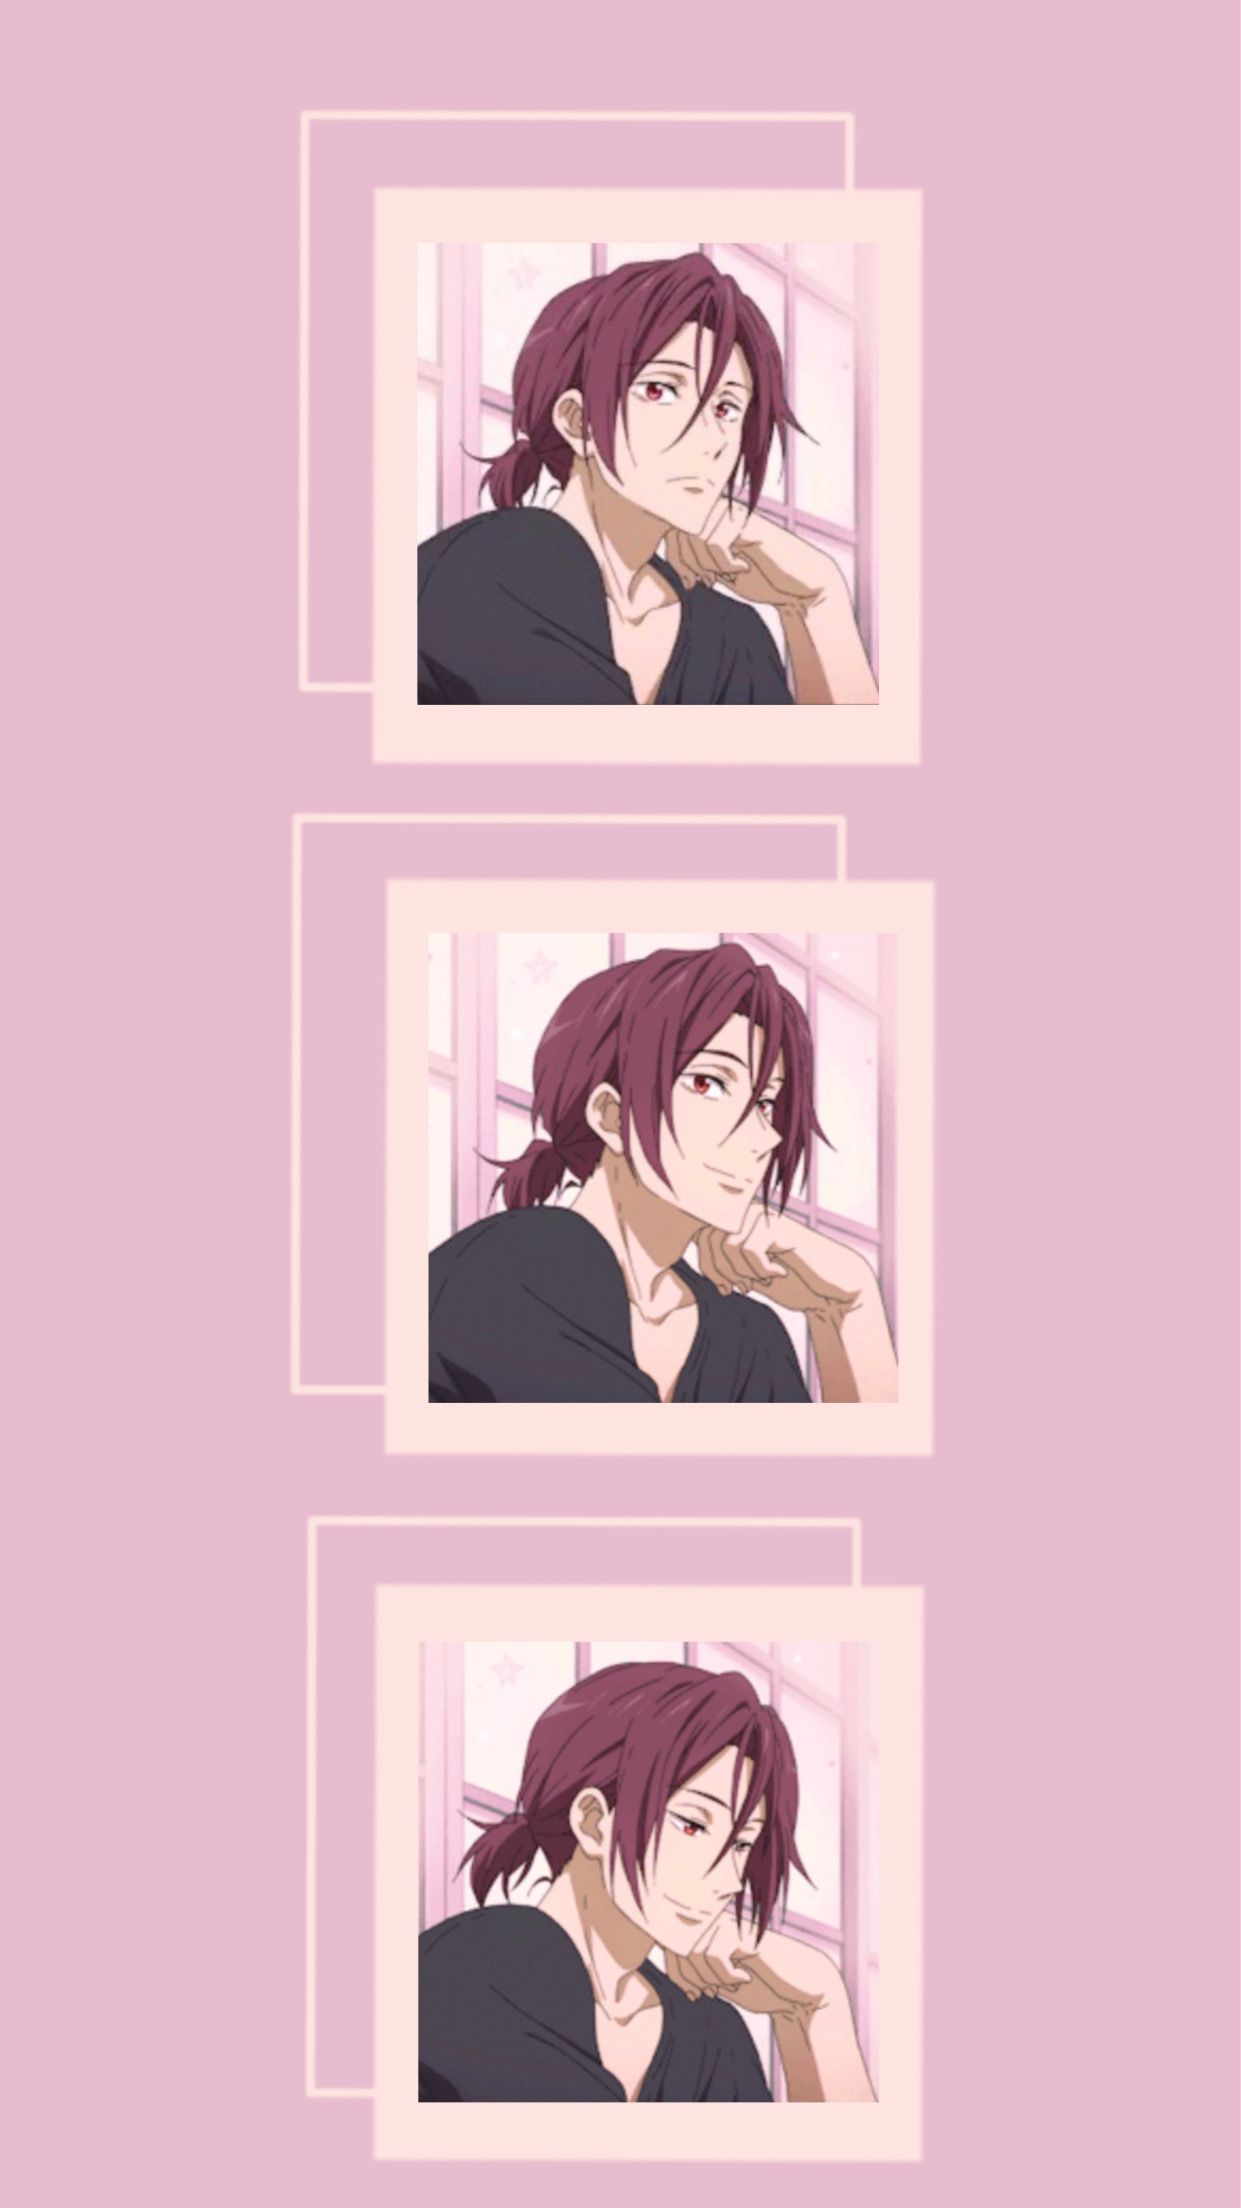 Free Rin Wallpaper Free Anime Anime Wallpaper Iphone Splash Free Anime wallpaper iphone free